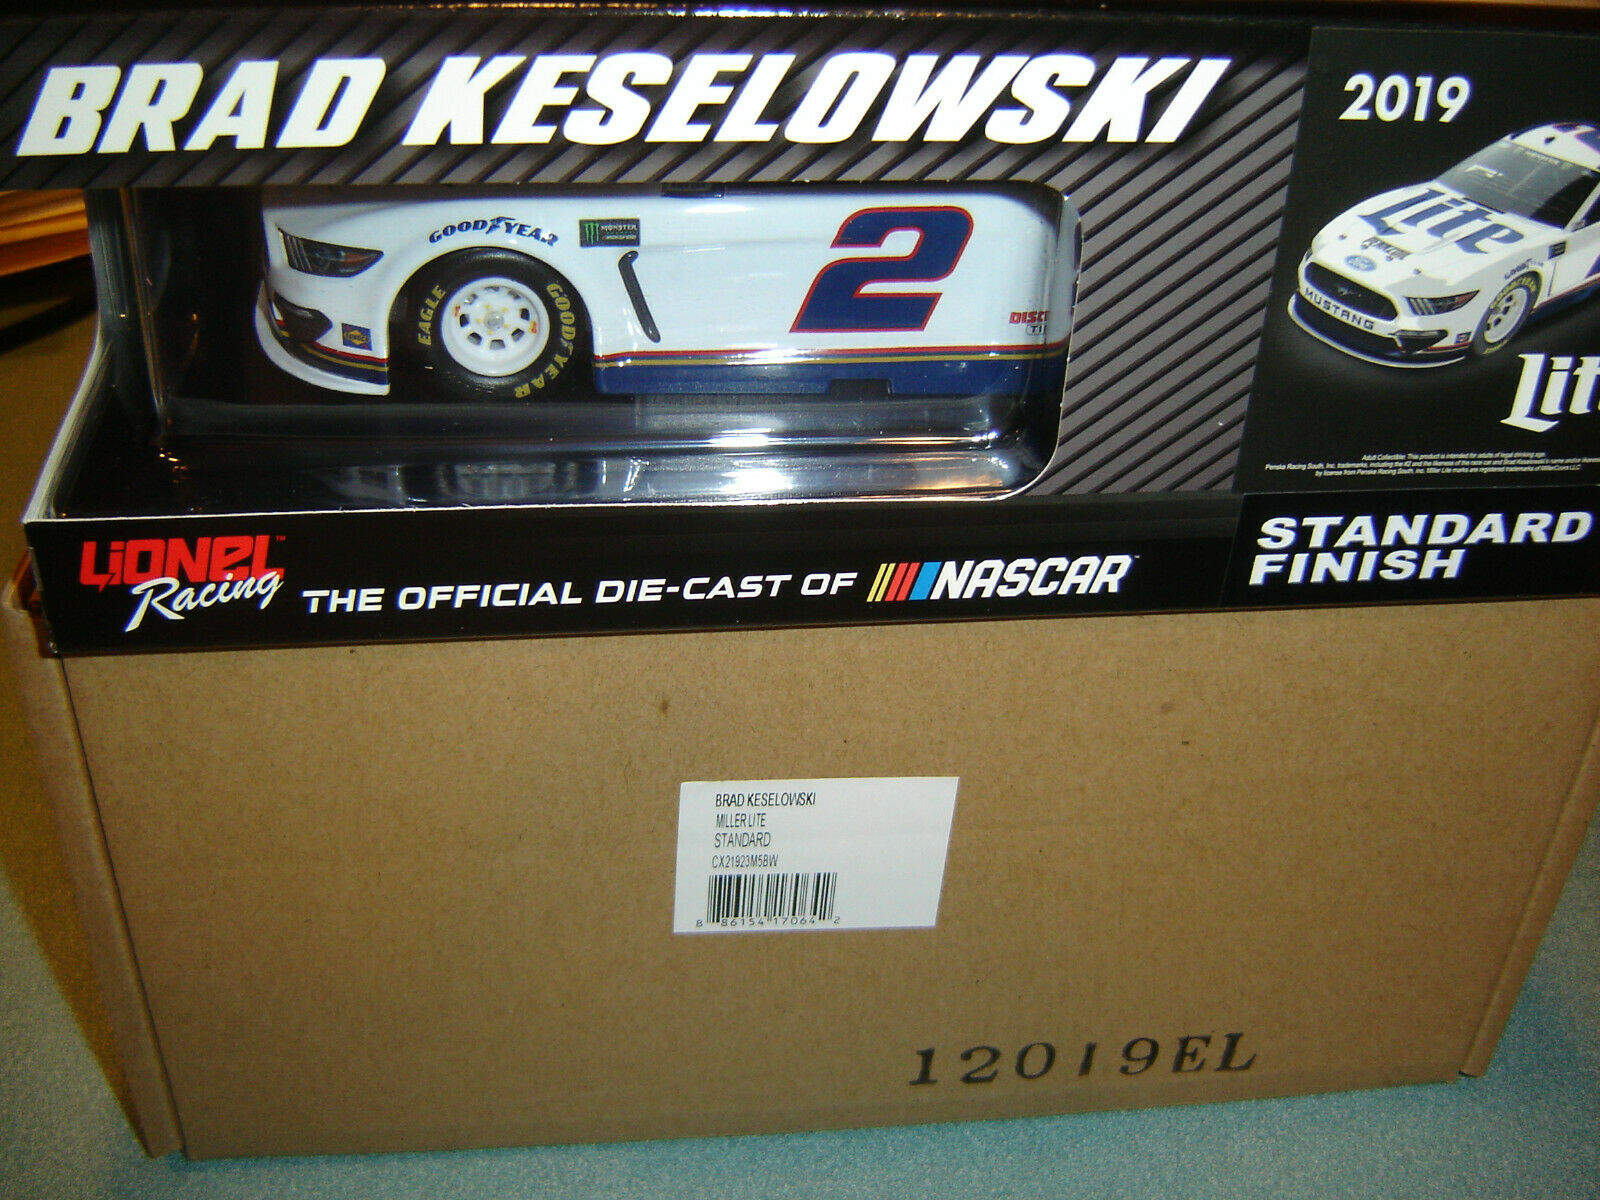 2019 Brad Keselowski  2 Miller Lite Bianco Ford 1 24 Action Nascar Pressofuso